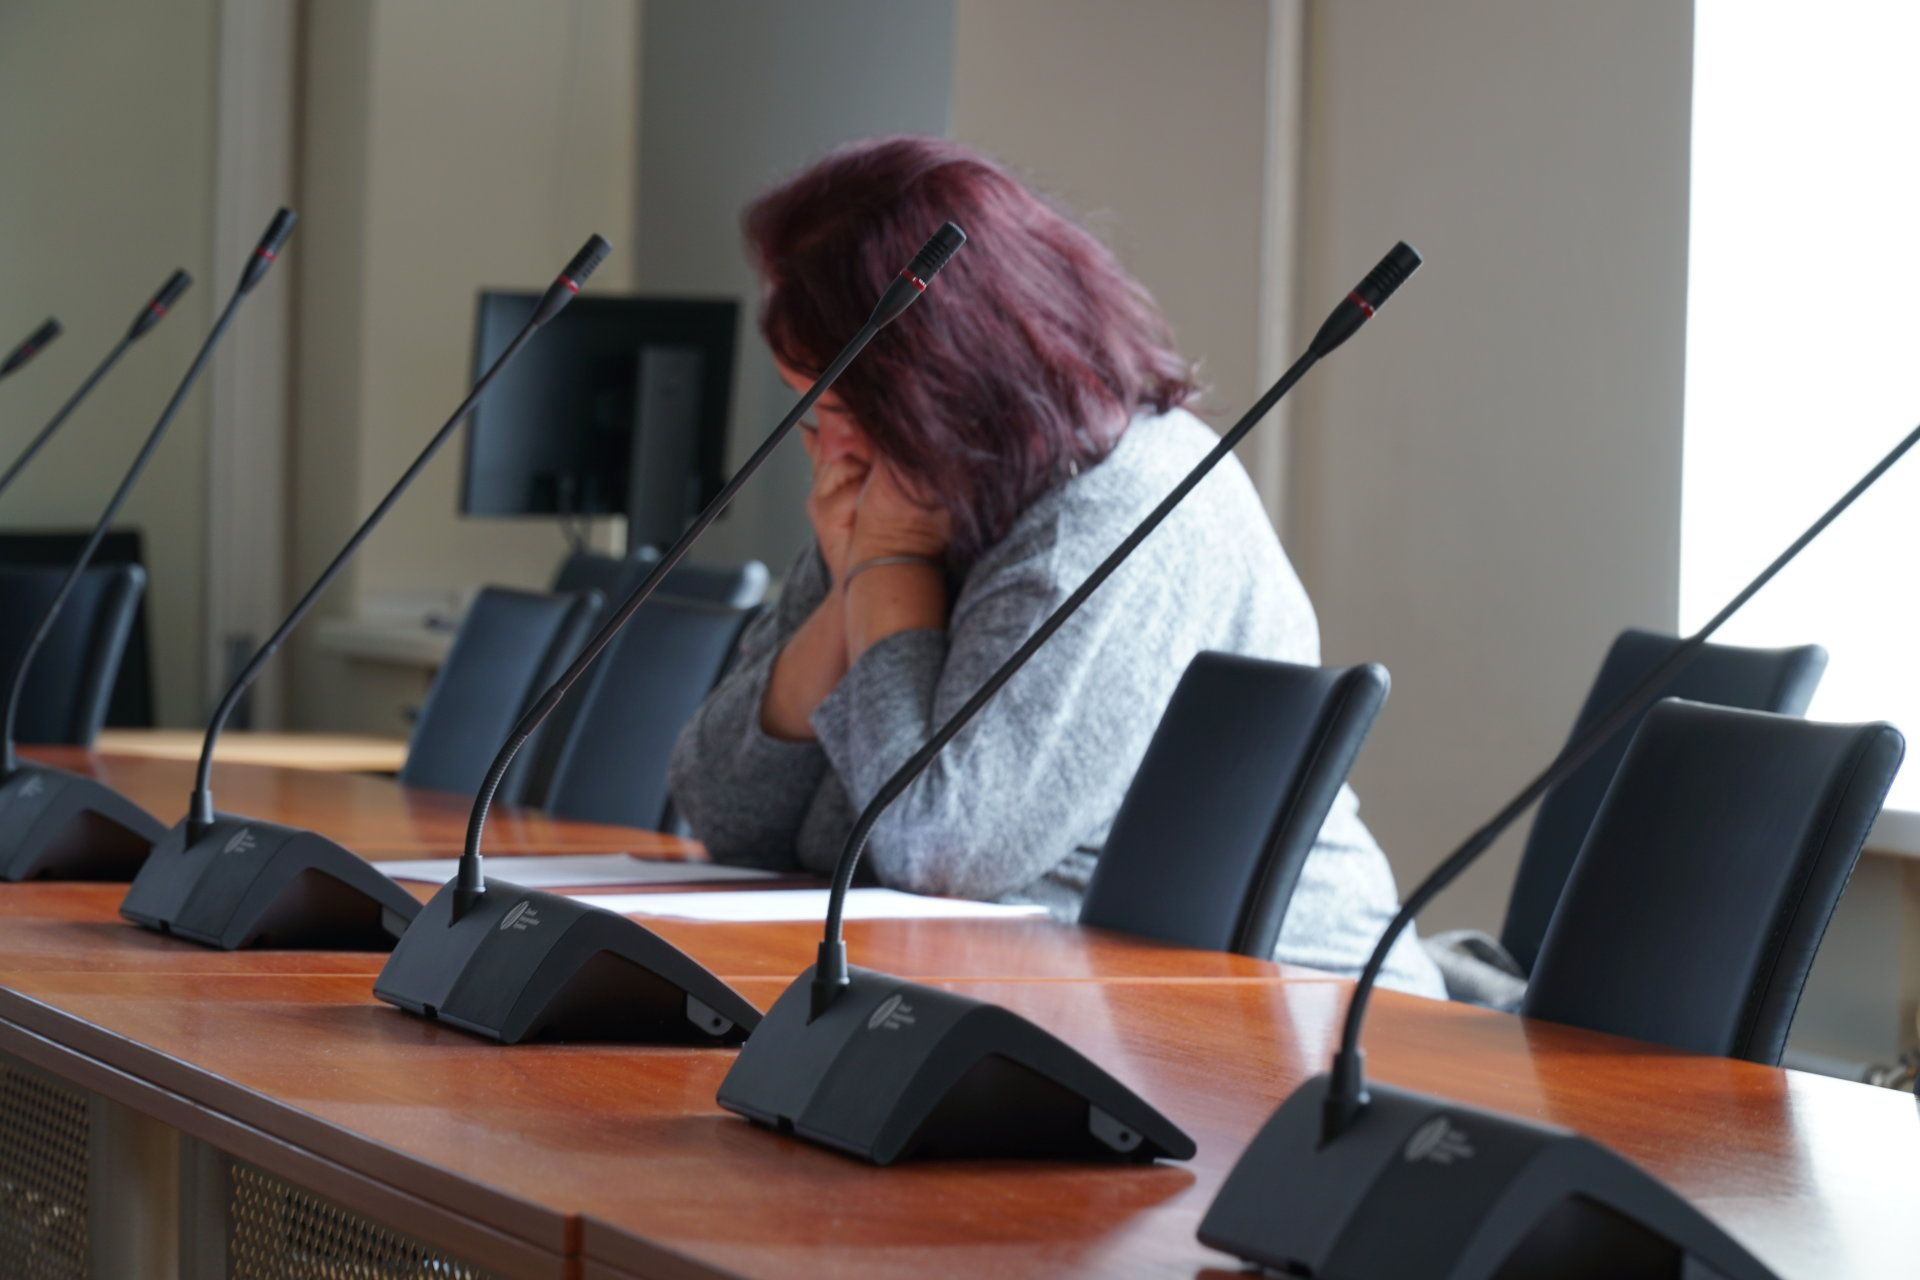 Lietuvos Respublikos Konstitucijos egzaminas (2019) - I etapas